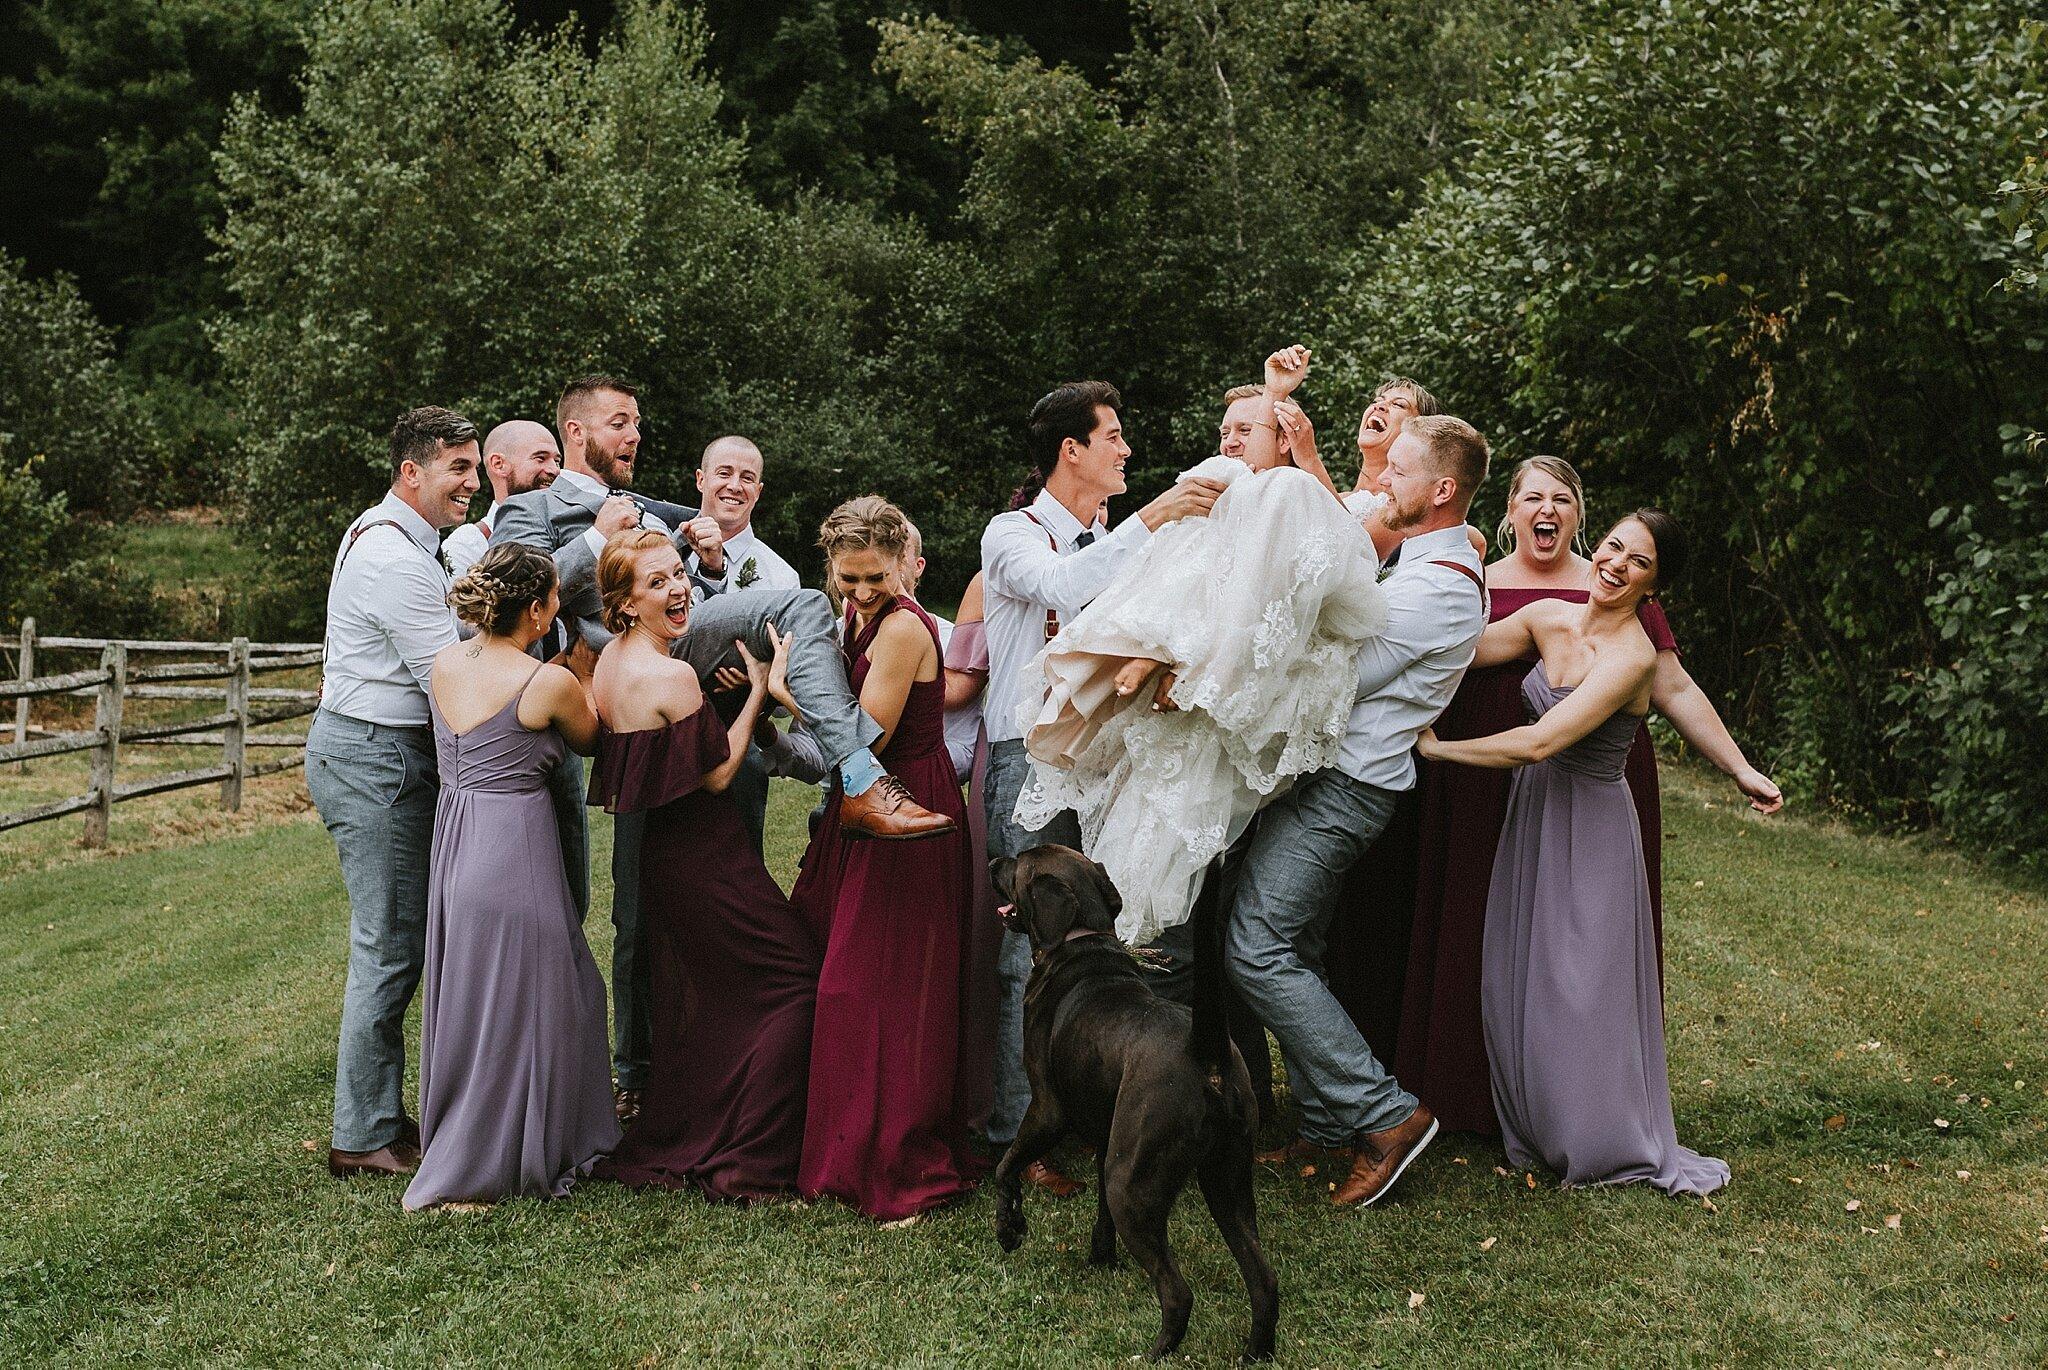 connecticut_wedding_3033.jpg